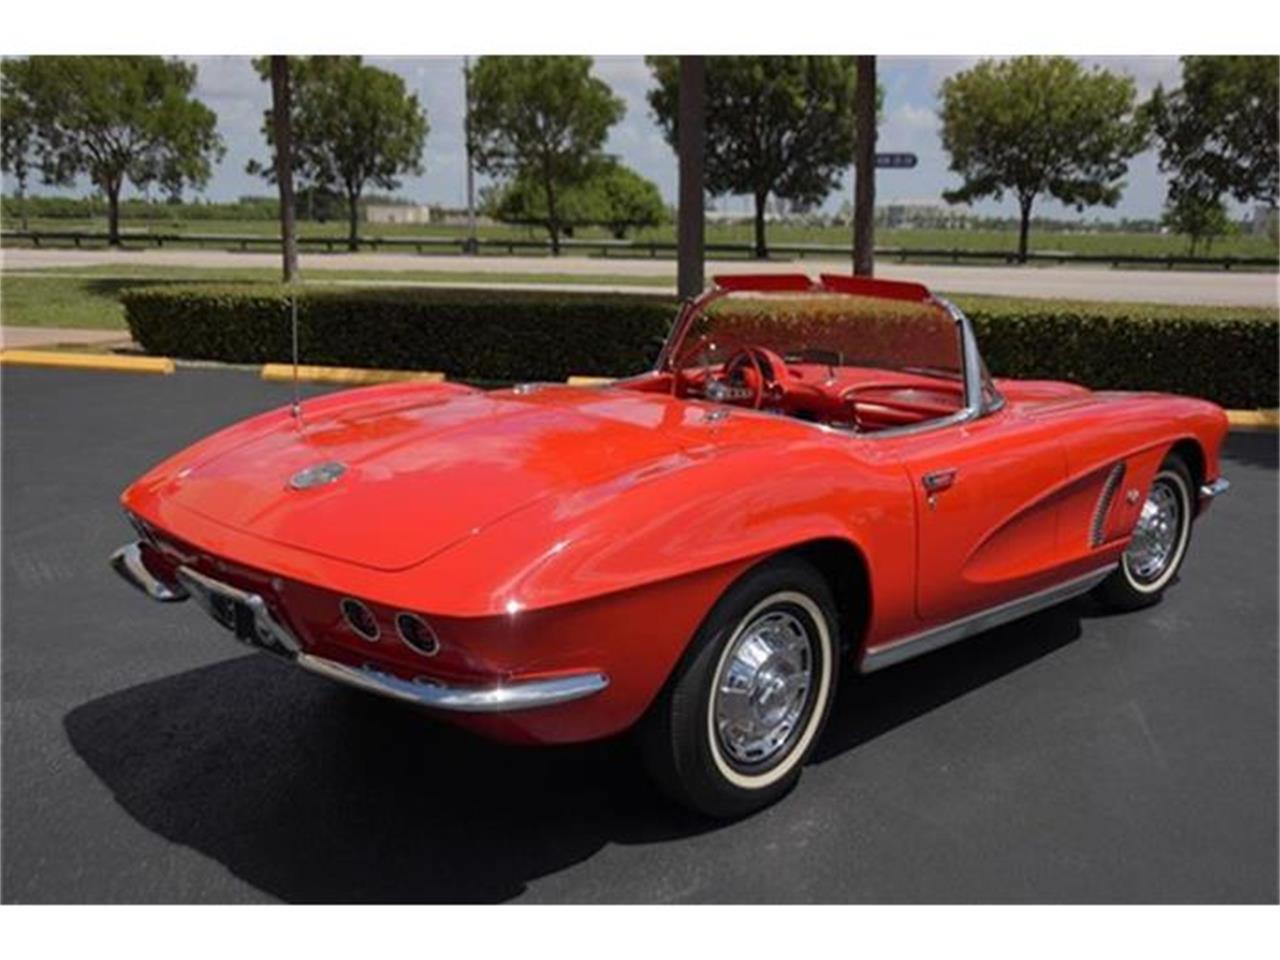 Large Picture of '62 Corvette - $59,900.00 - EYPB